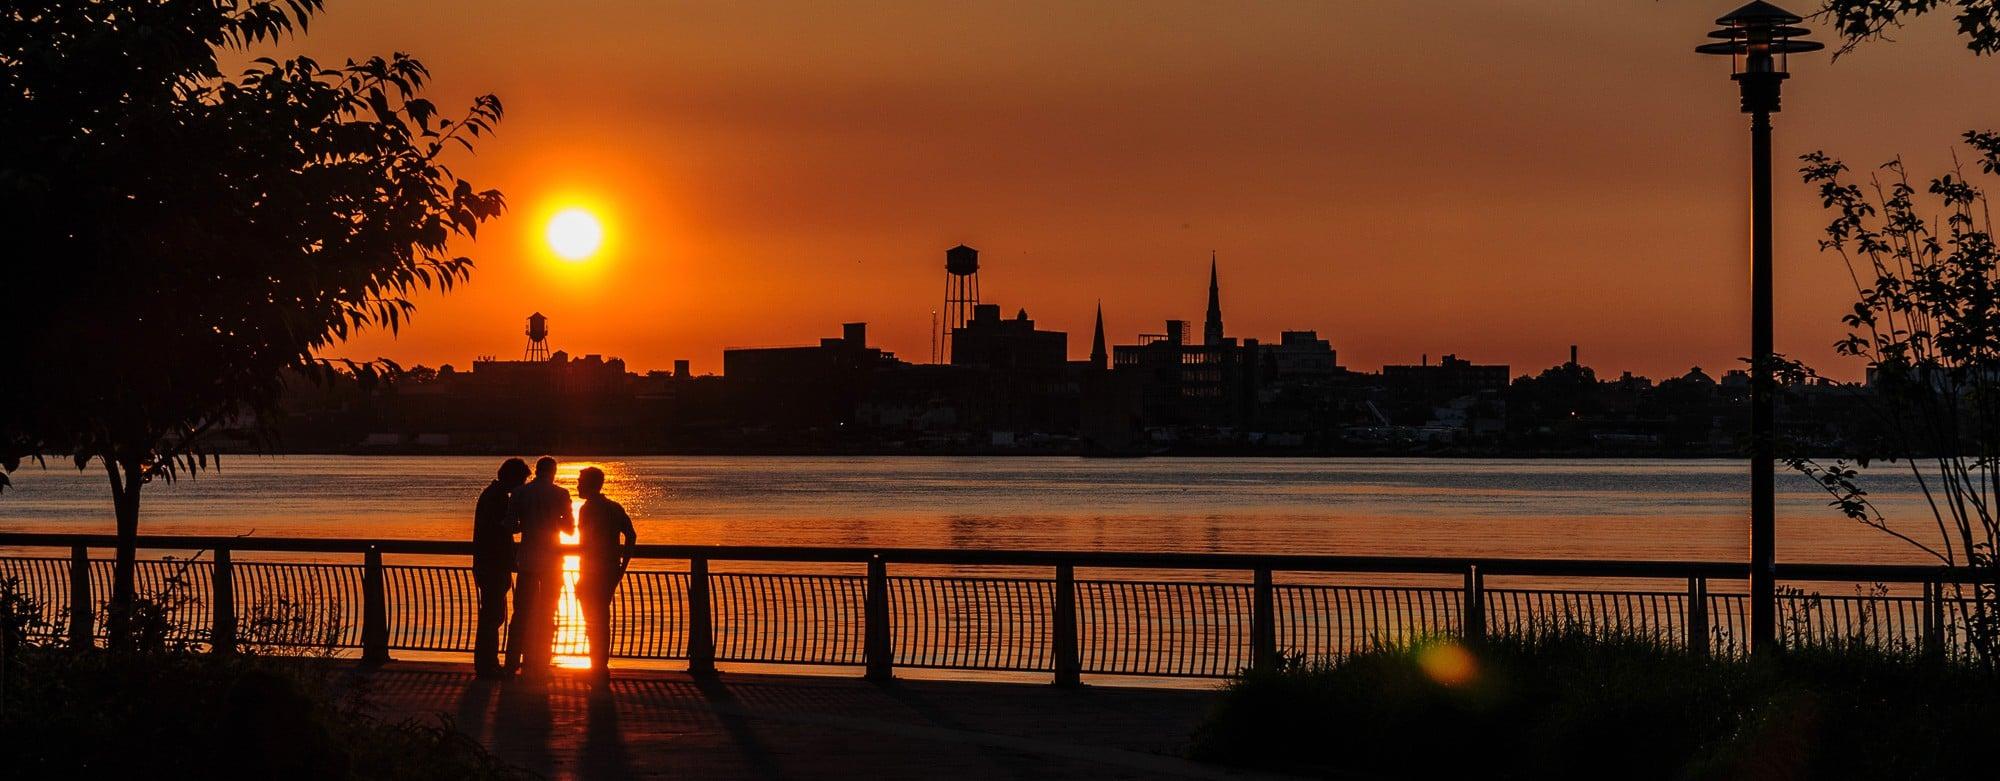 East-River-Park-Sunrise